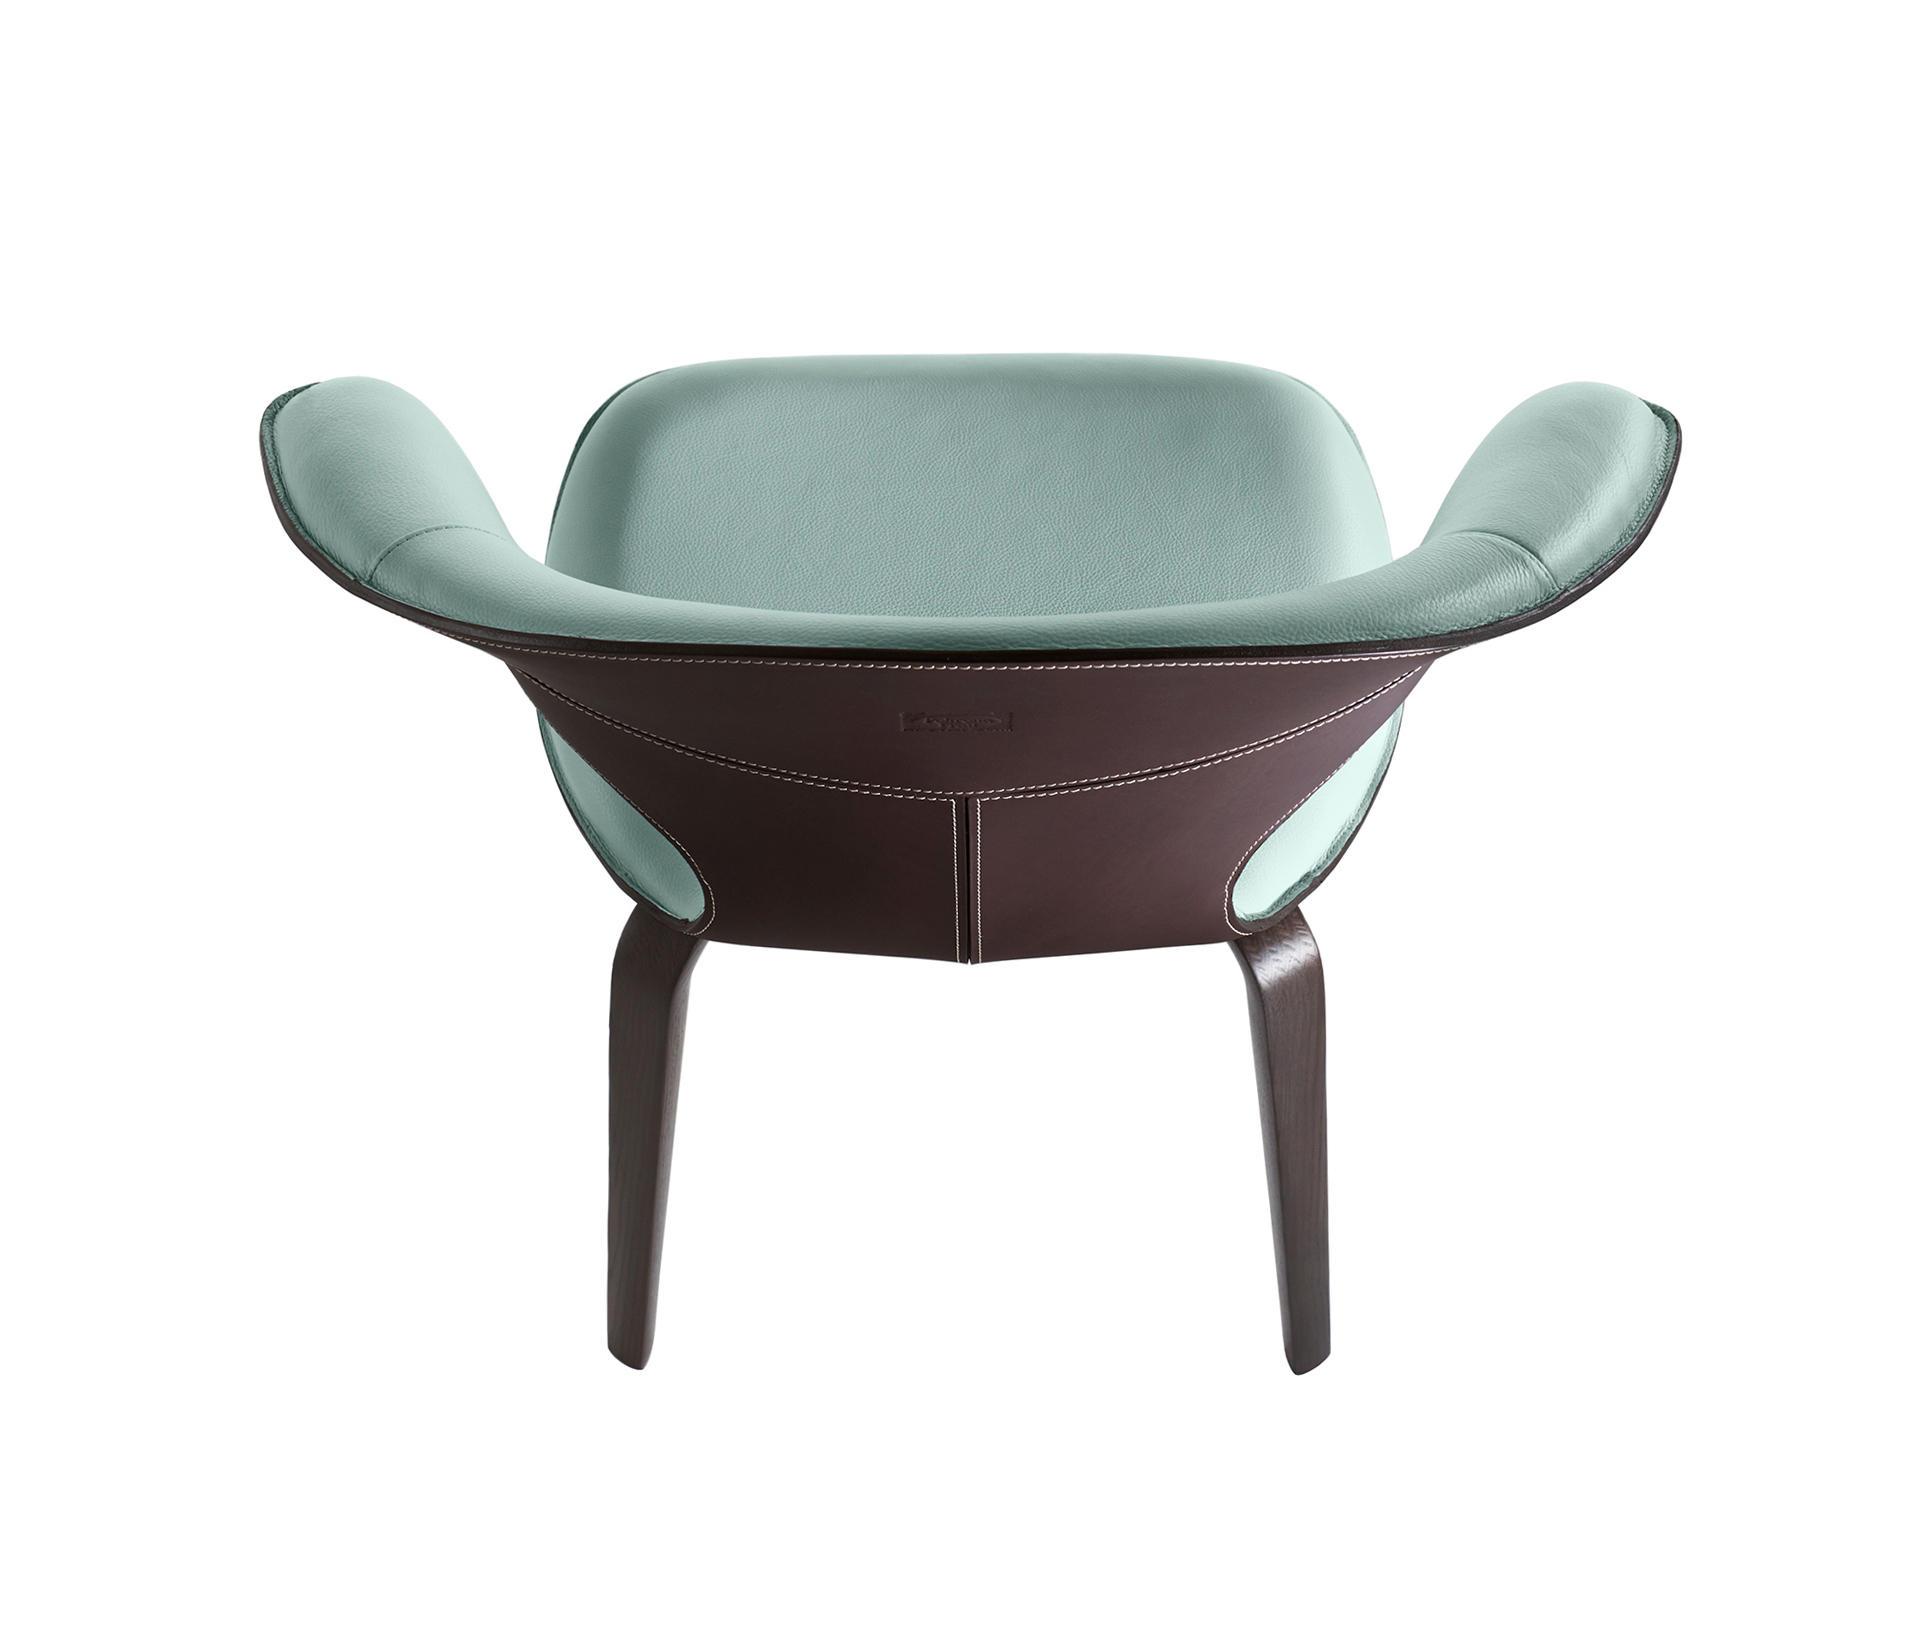 montera sessel restaurantst hle von poltrona frau. Black Bedroom Furniture Sets. Home Design Ideas